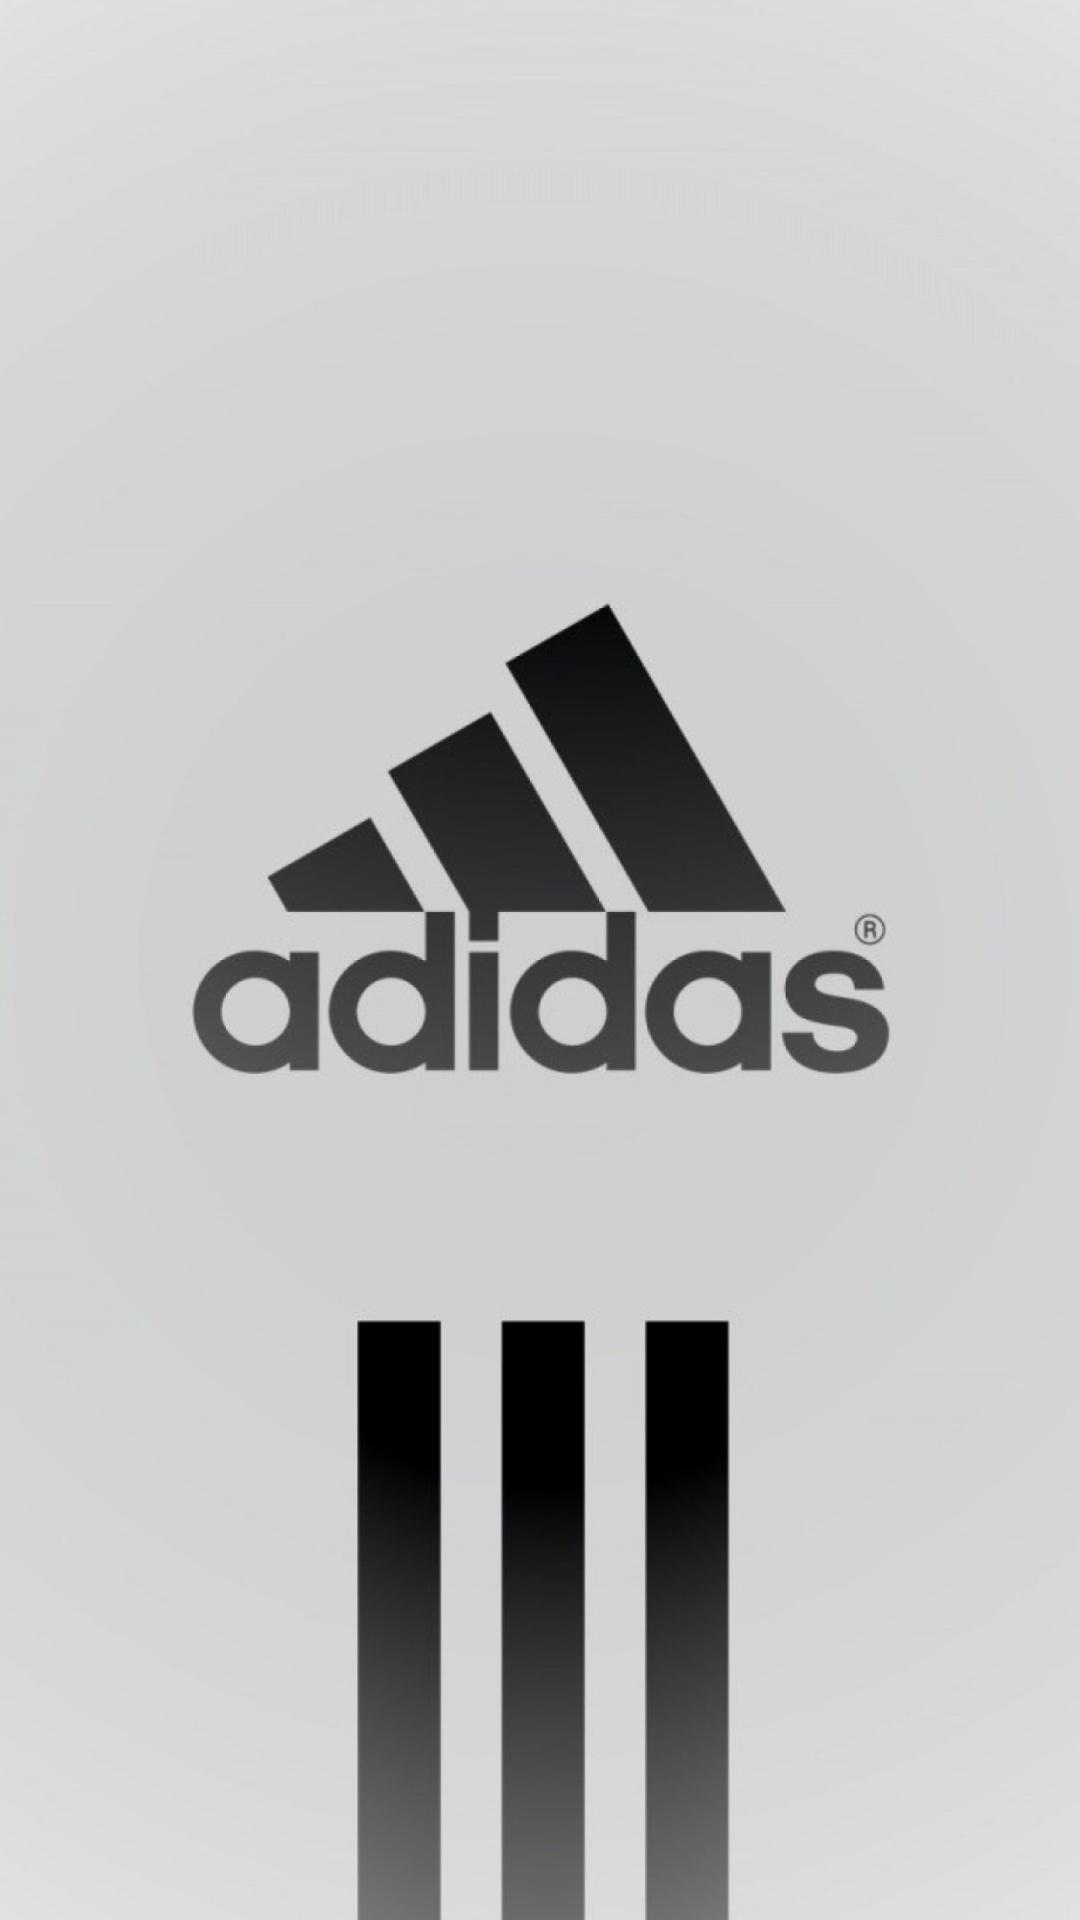 wallpaper.wiki-Adidas-Iphone-HD-Wallpaper-PIC-WPC0014224